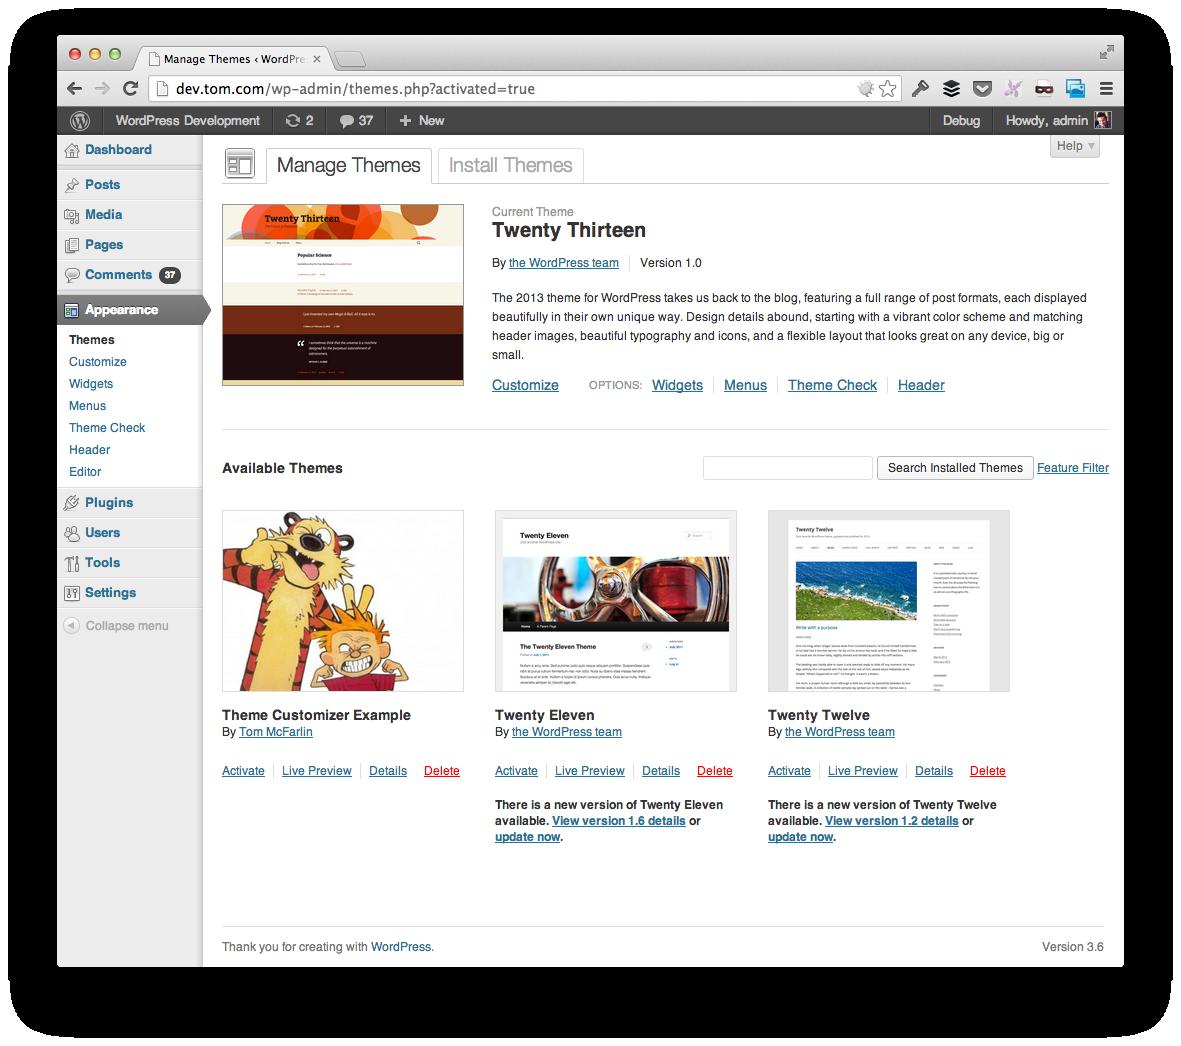 Theme Customizer Example